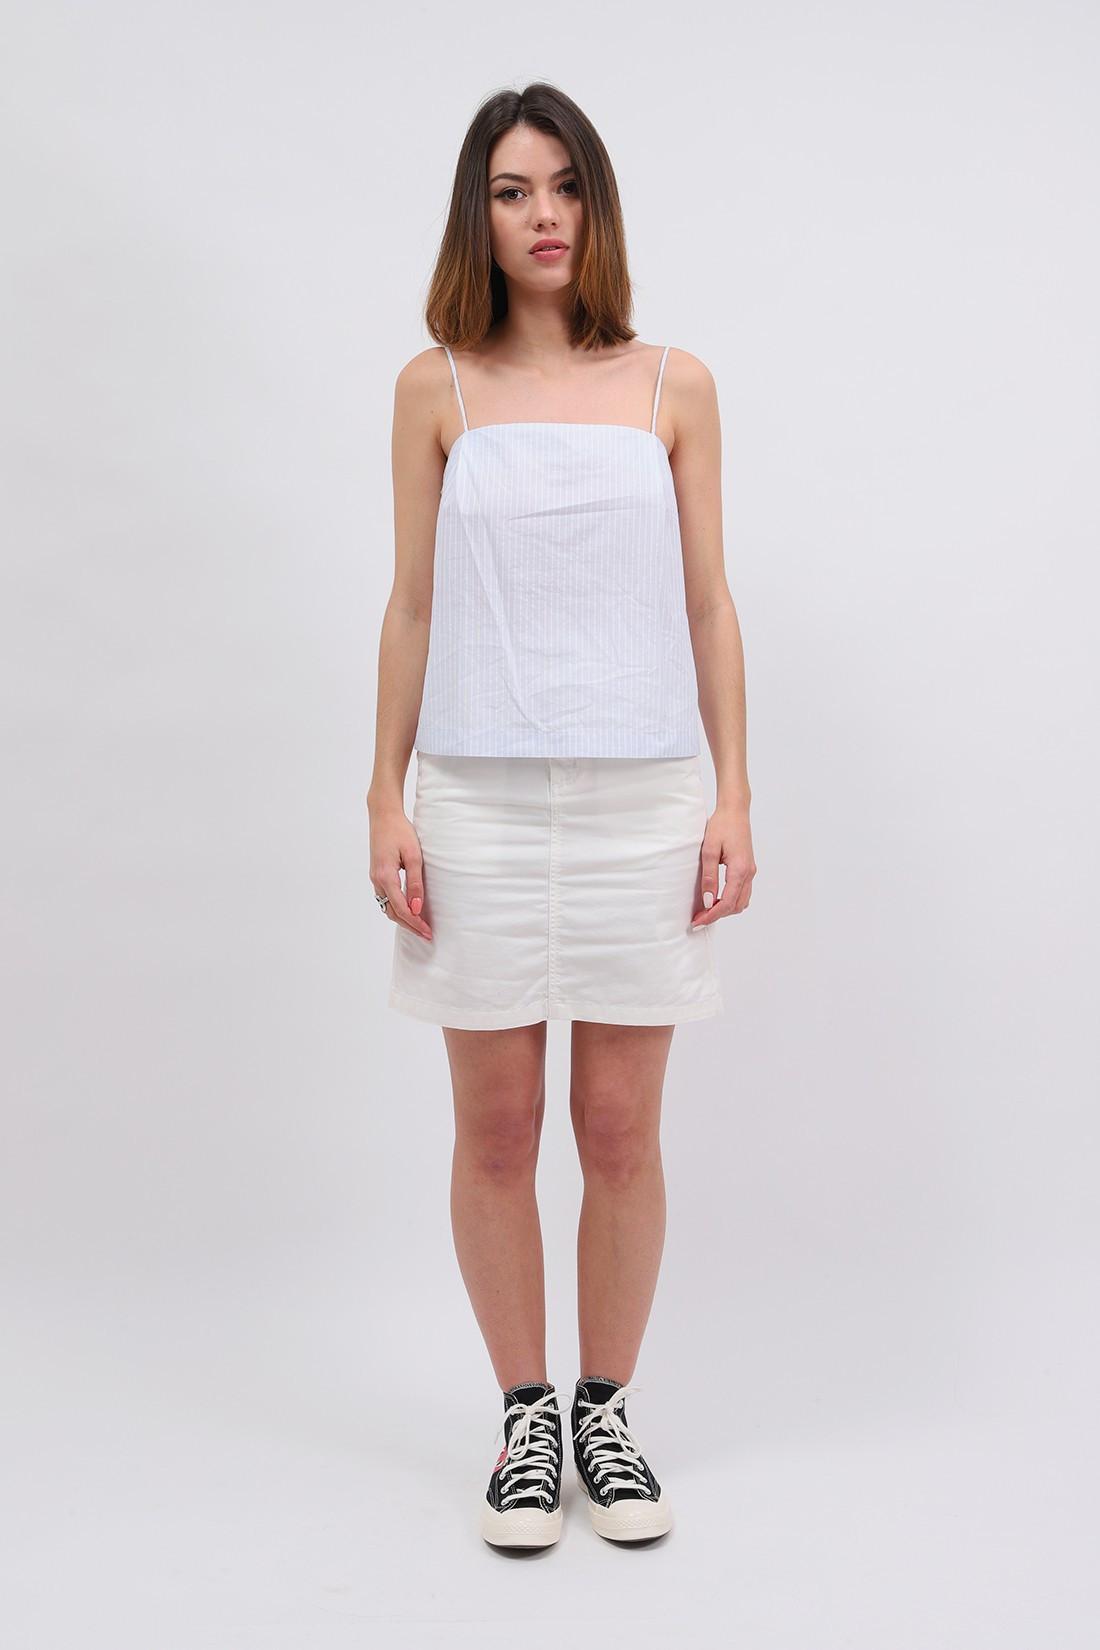 BELLEROSE FOR WOMAN / Such top Stripe d